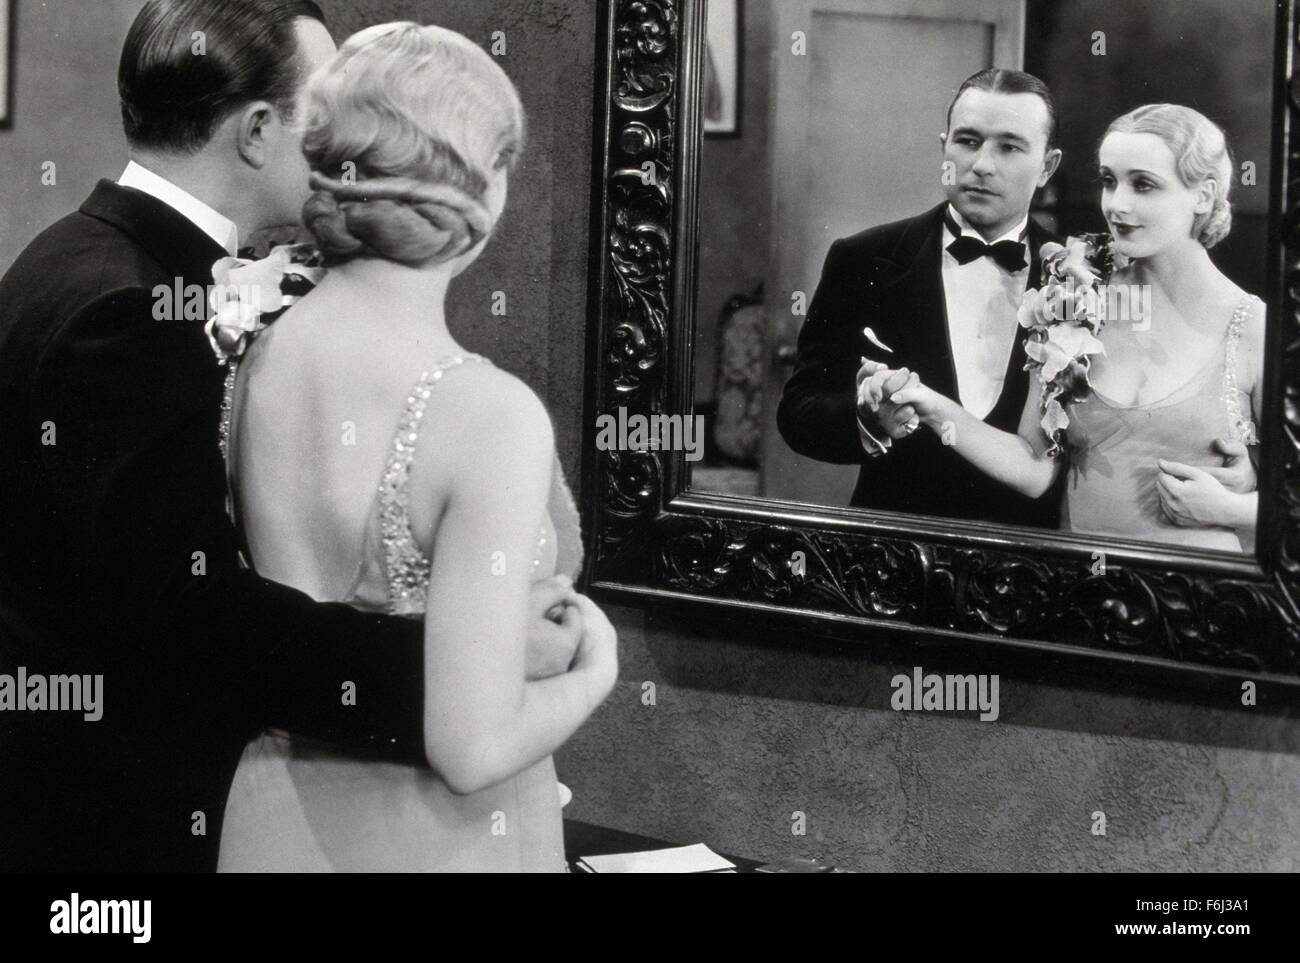 1930, Film Title: RACKETEER, Director: HOWARD HIGGINS, Studio: PATHE, Pictured: ACCESSORIES, ROBERT ARMSTRONG, HOWARD - Stock Image